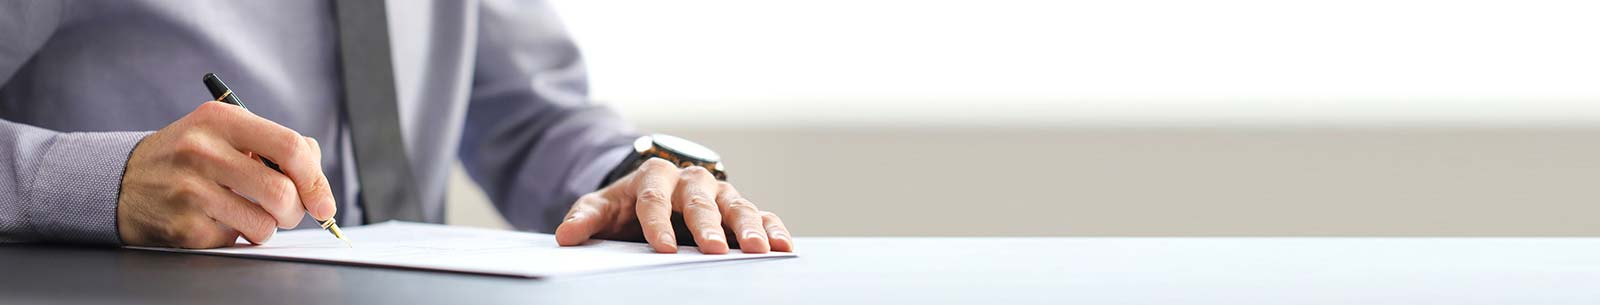 Man holding pen signing document